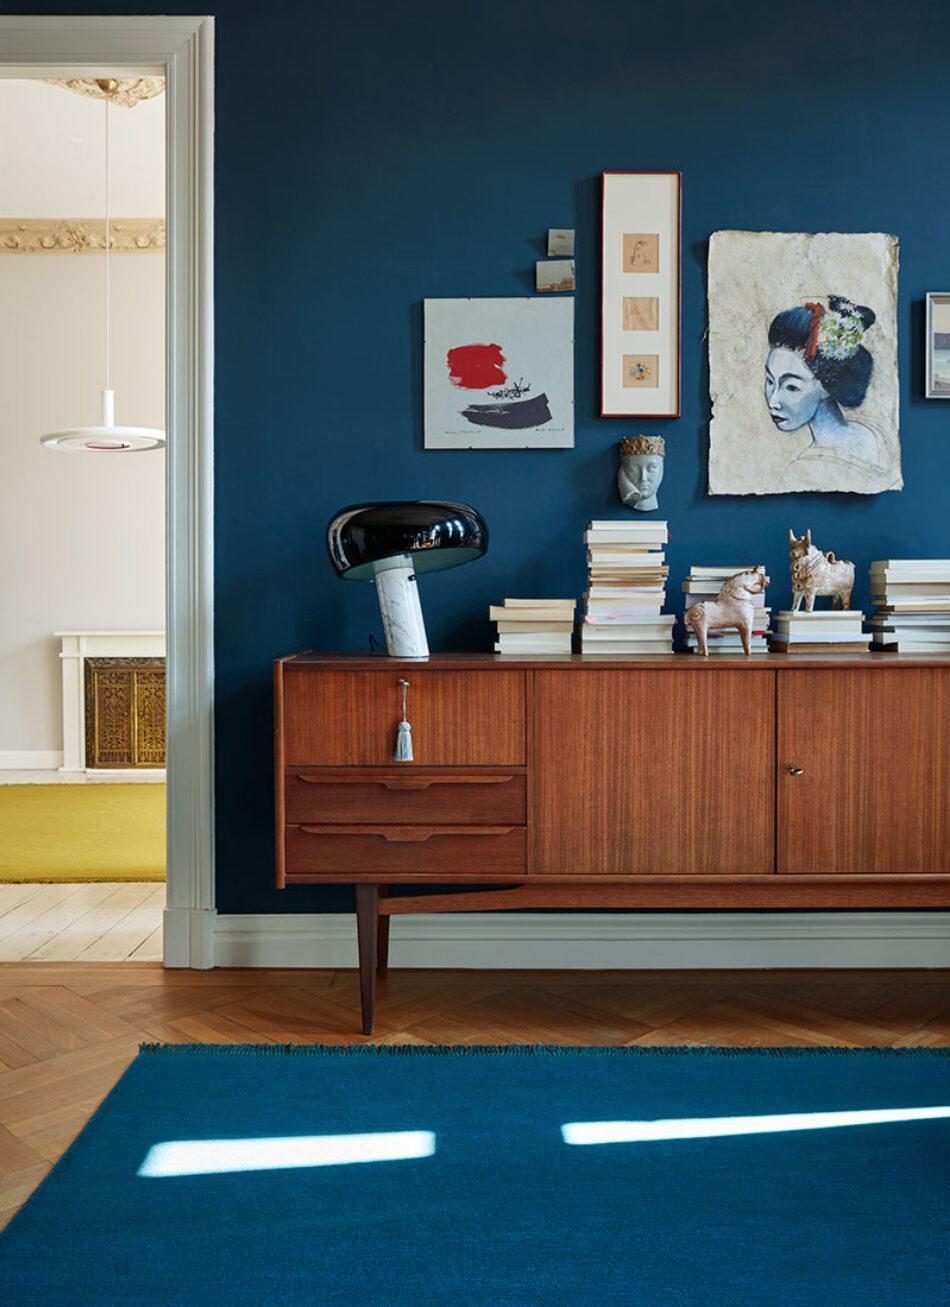 Antonius Schimmelbusch_Apartment Berlin_Hiepler, Brunier + Ragner Schmuck_privat_03